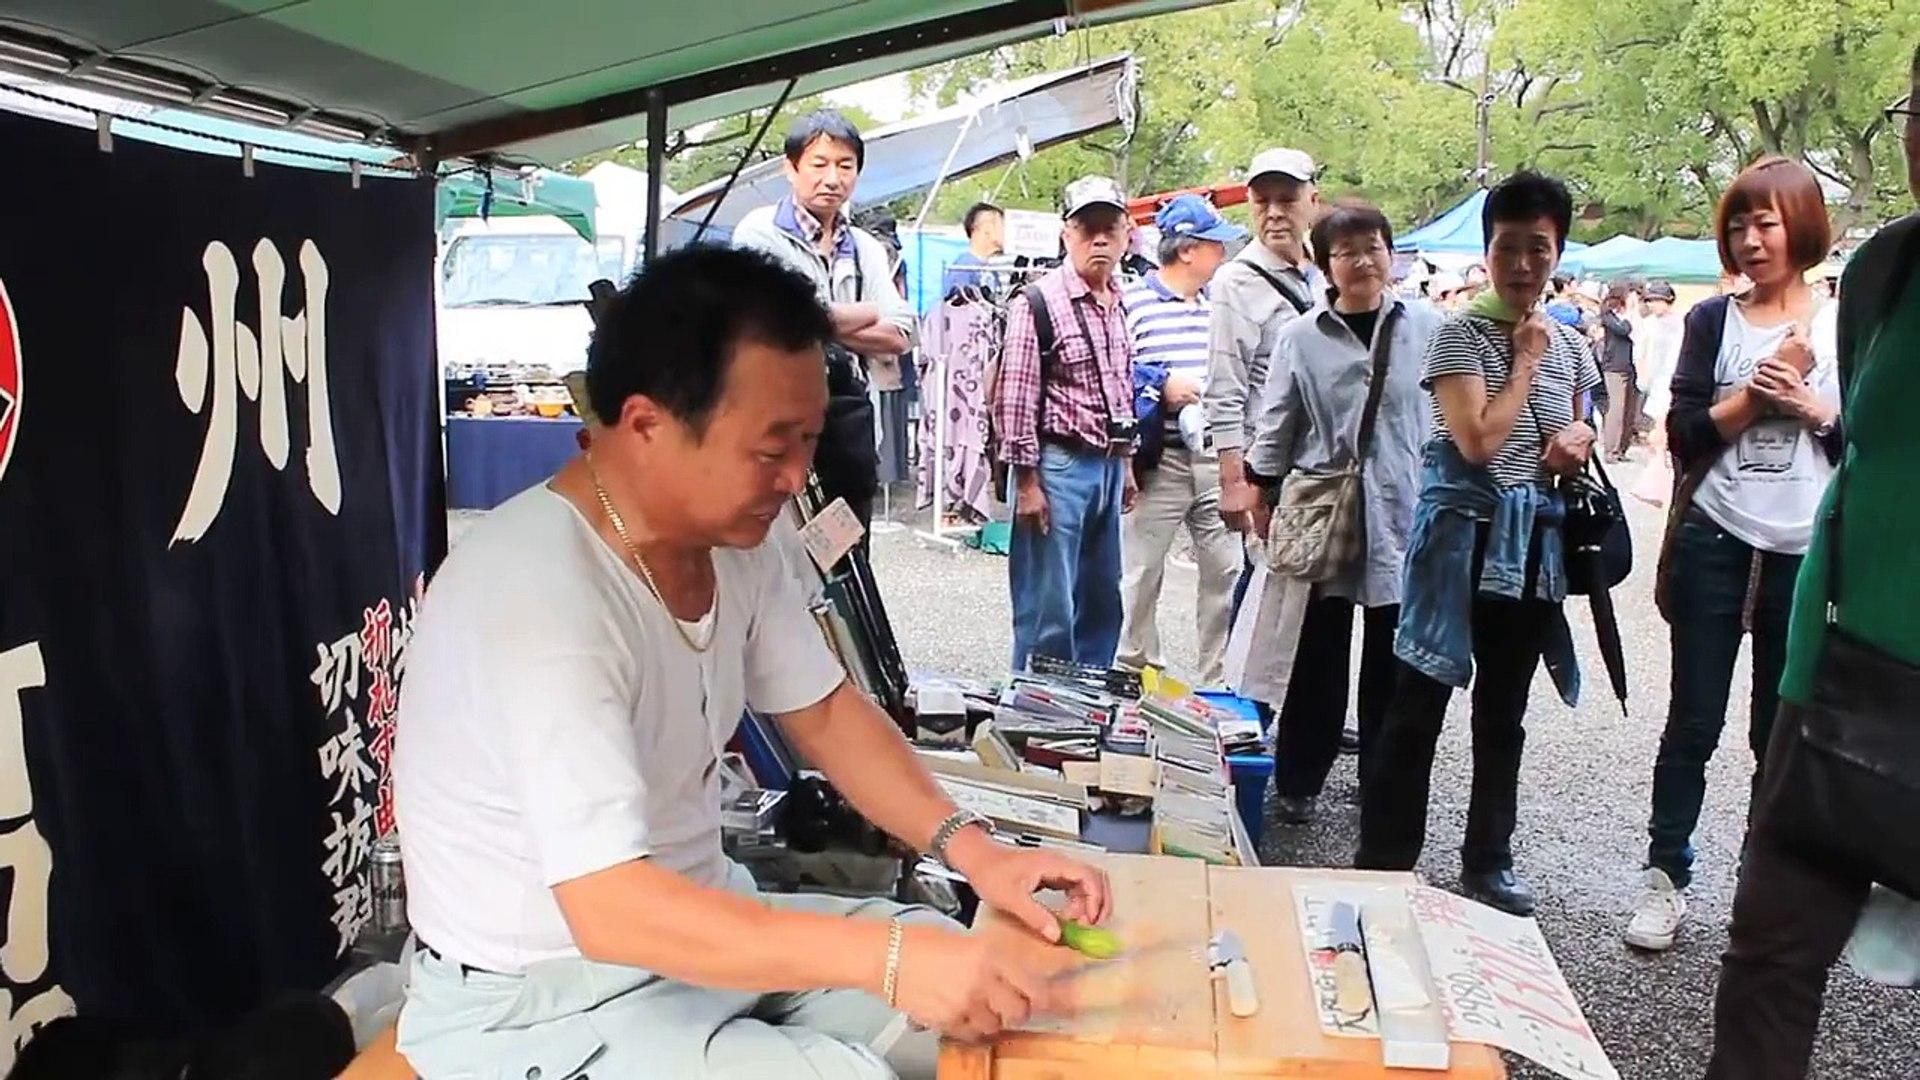 [HD] Japanese Kitchen Knife Demonstration in Kyoto